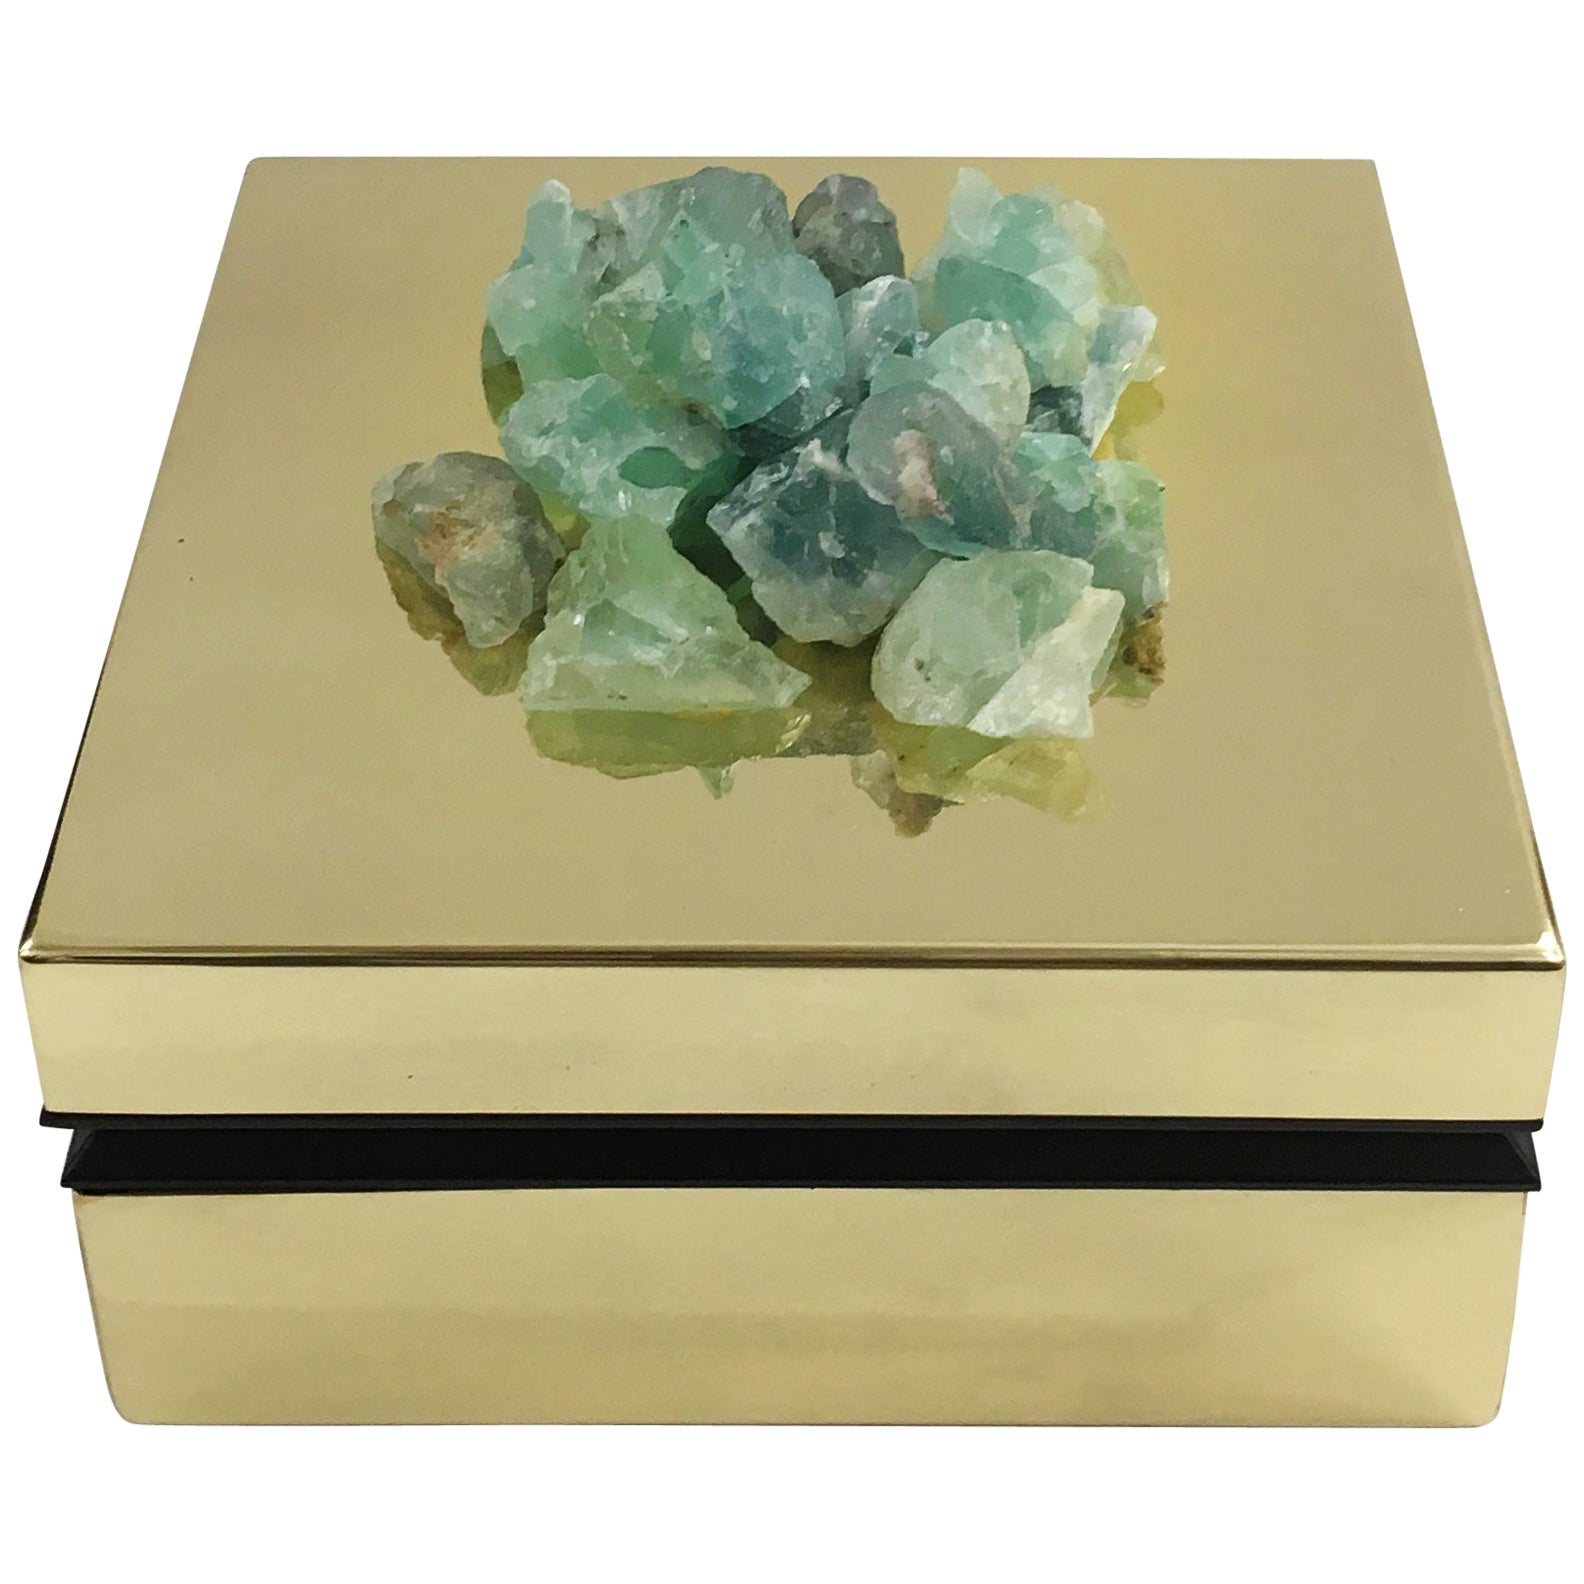 Fluorite and Brass Jewelry Deco Box